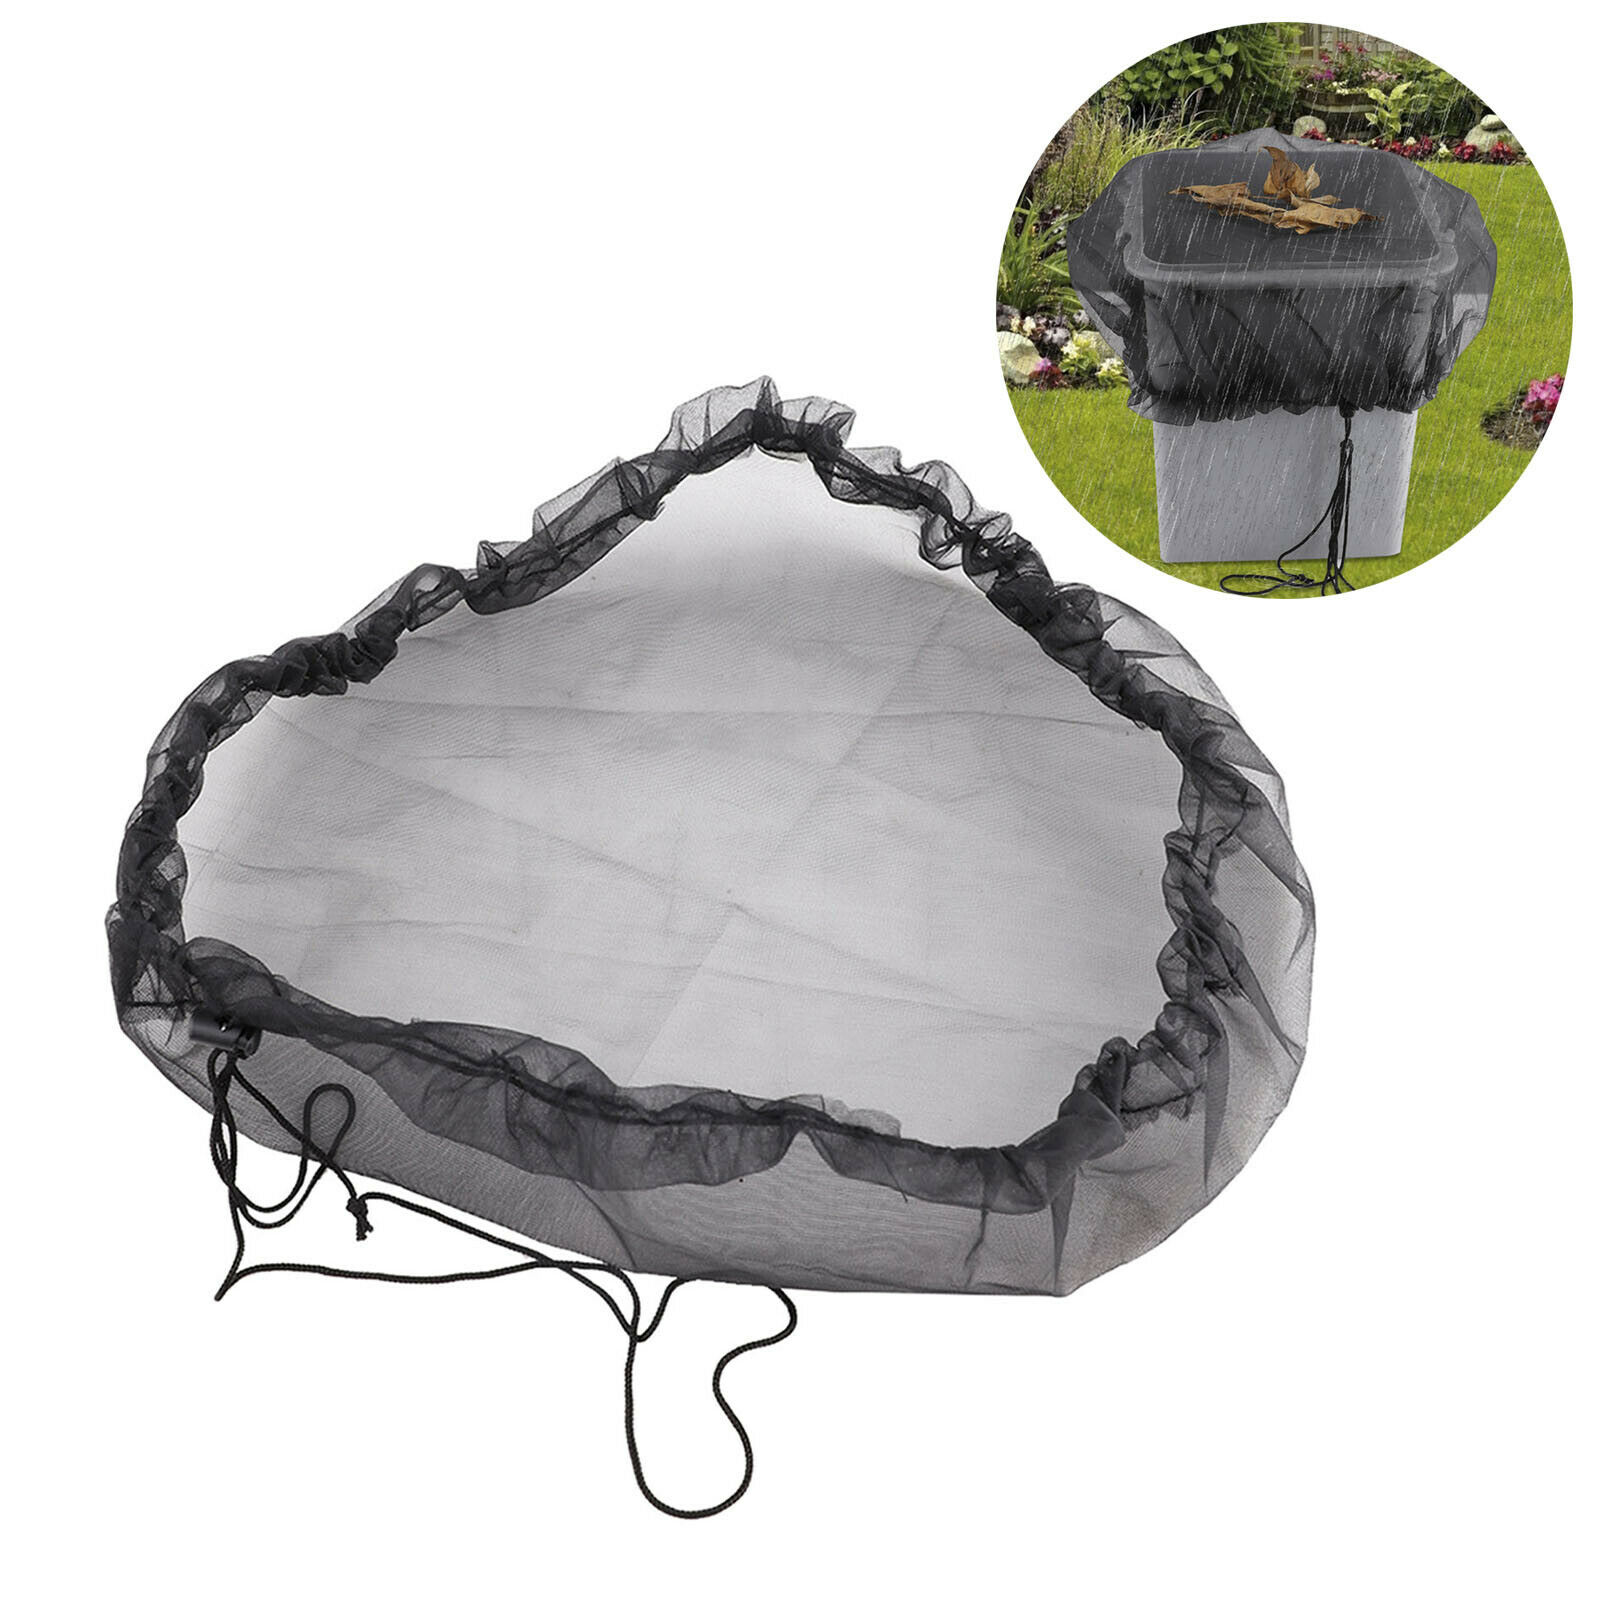 Outdoor Garden Rain Barrels Mesh Cover Netting Wrap Tank Bag Protectivet Covers